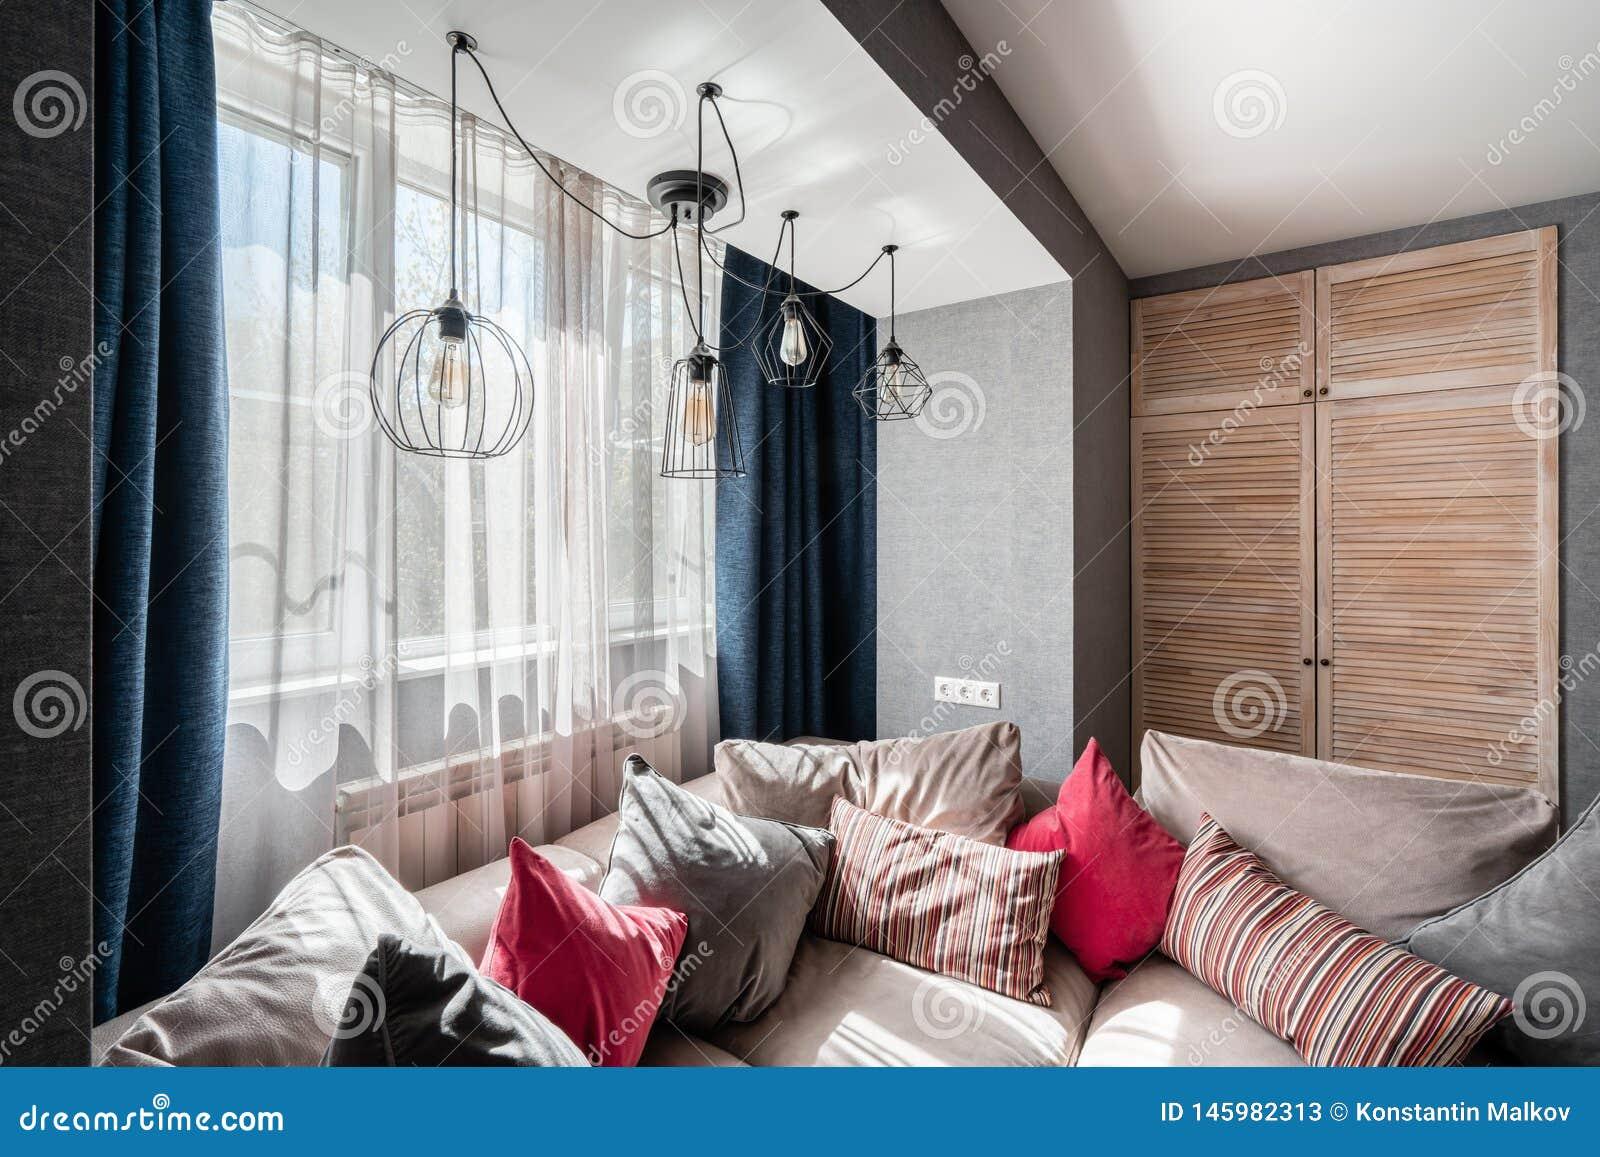 Russia Nizhny Novgorod April 26 2019 Private Apartment